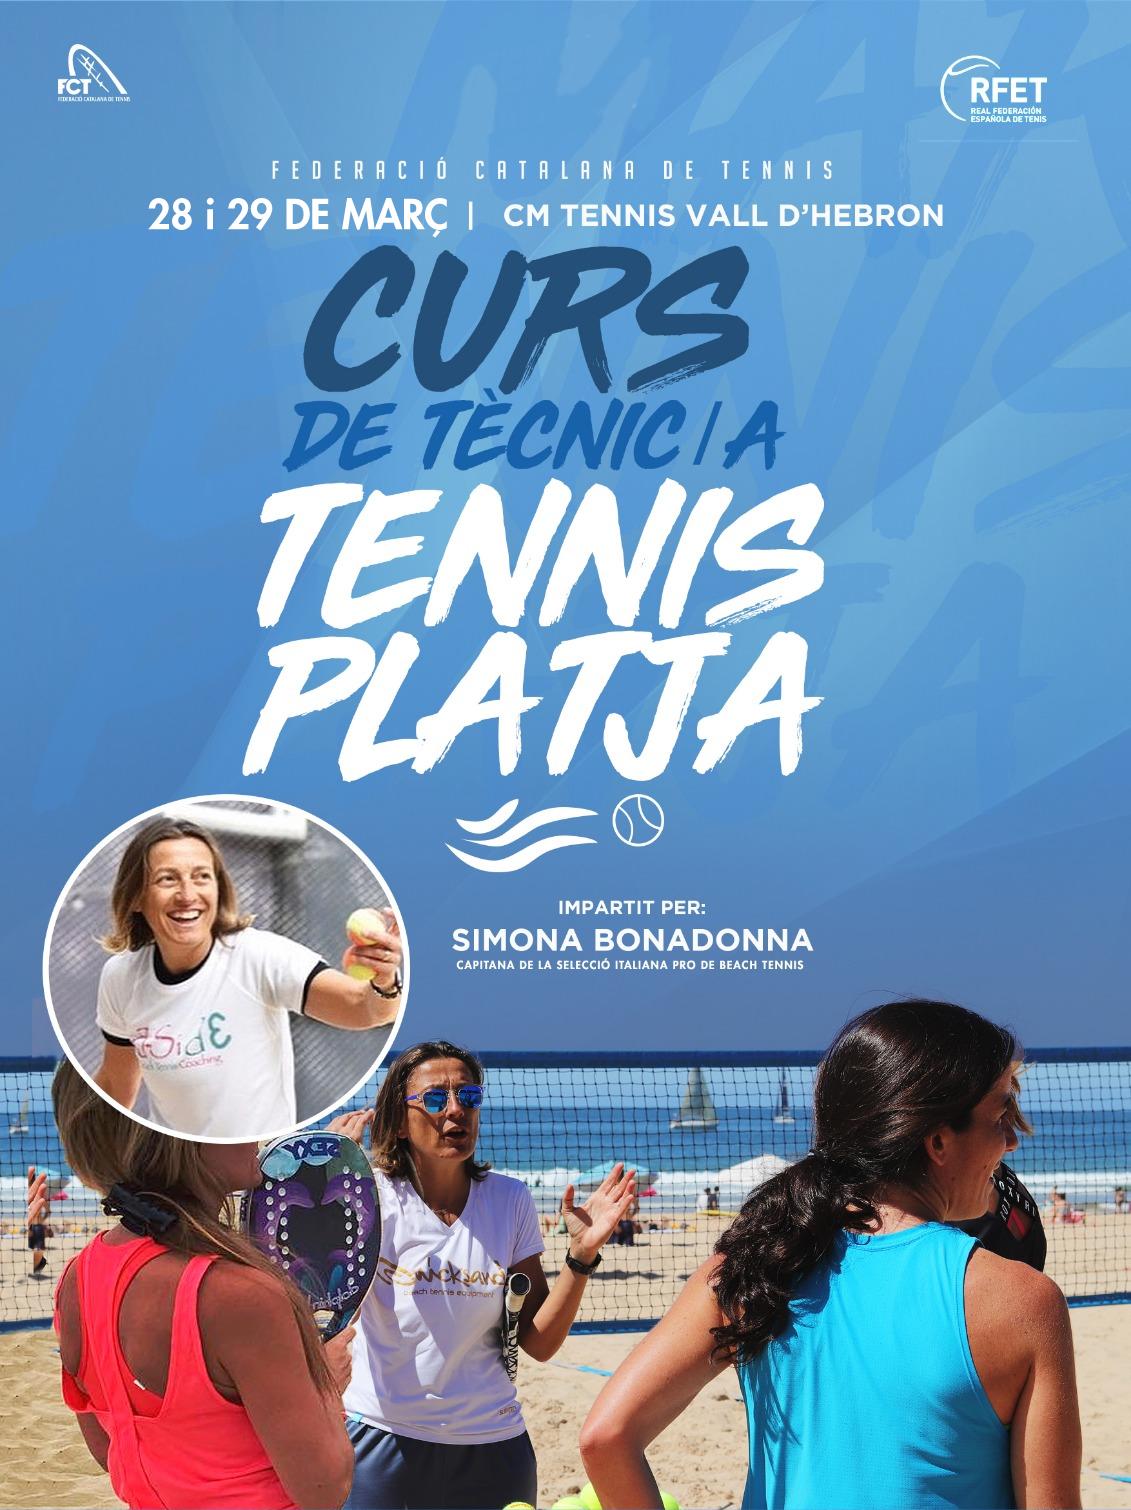 Curs Tècnic_a Tennis Platja